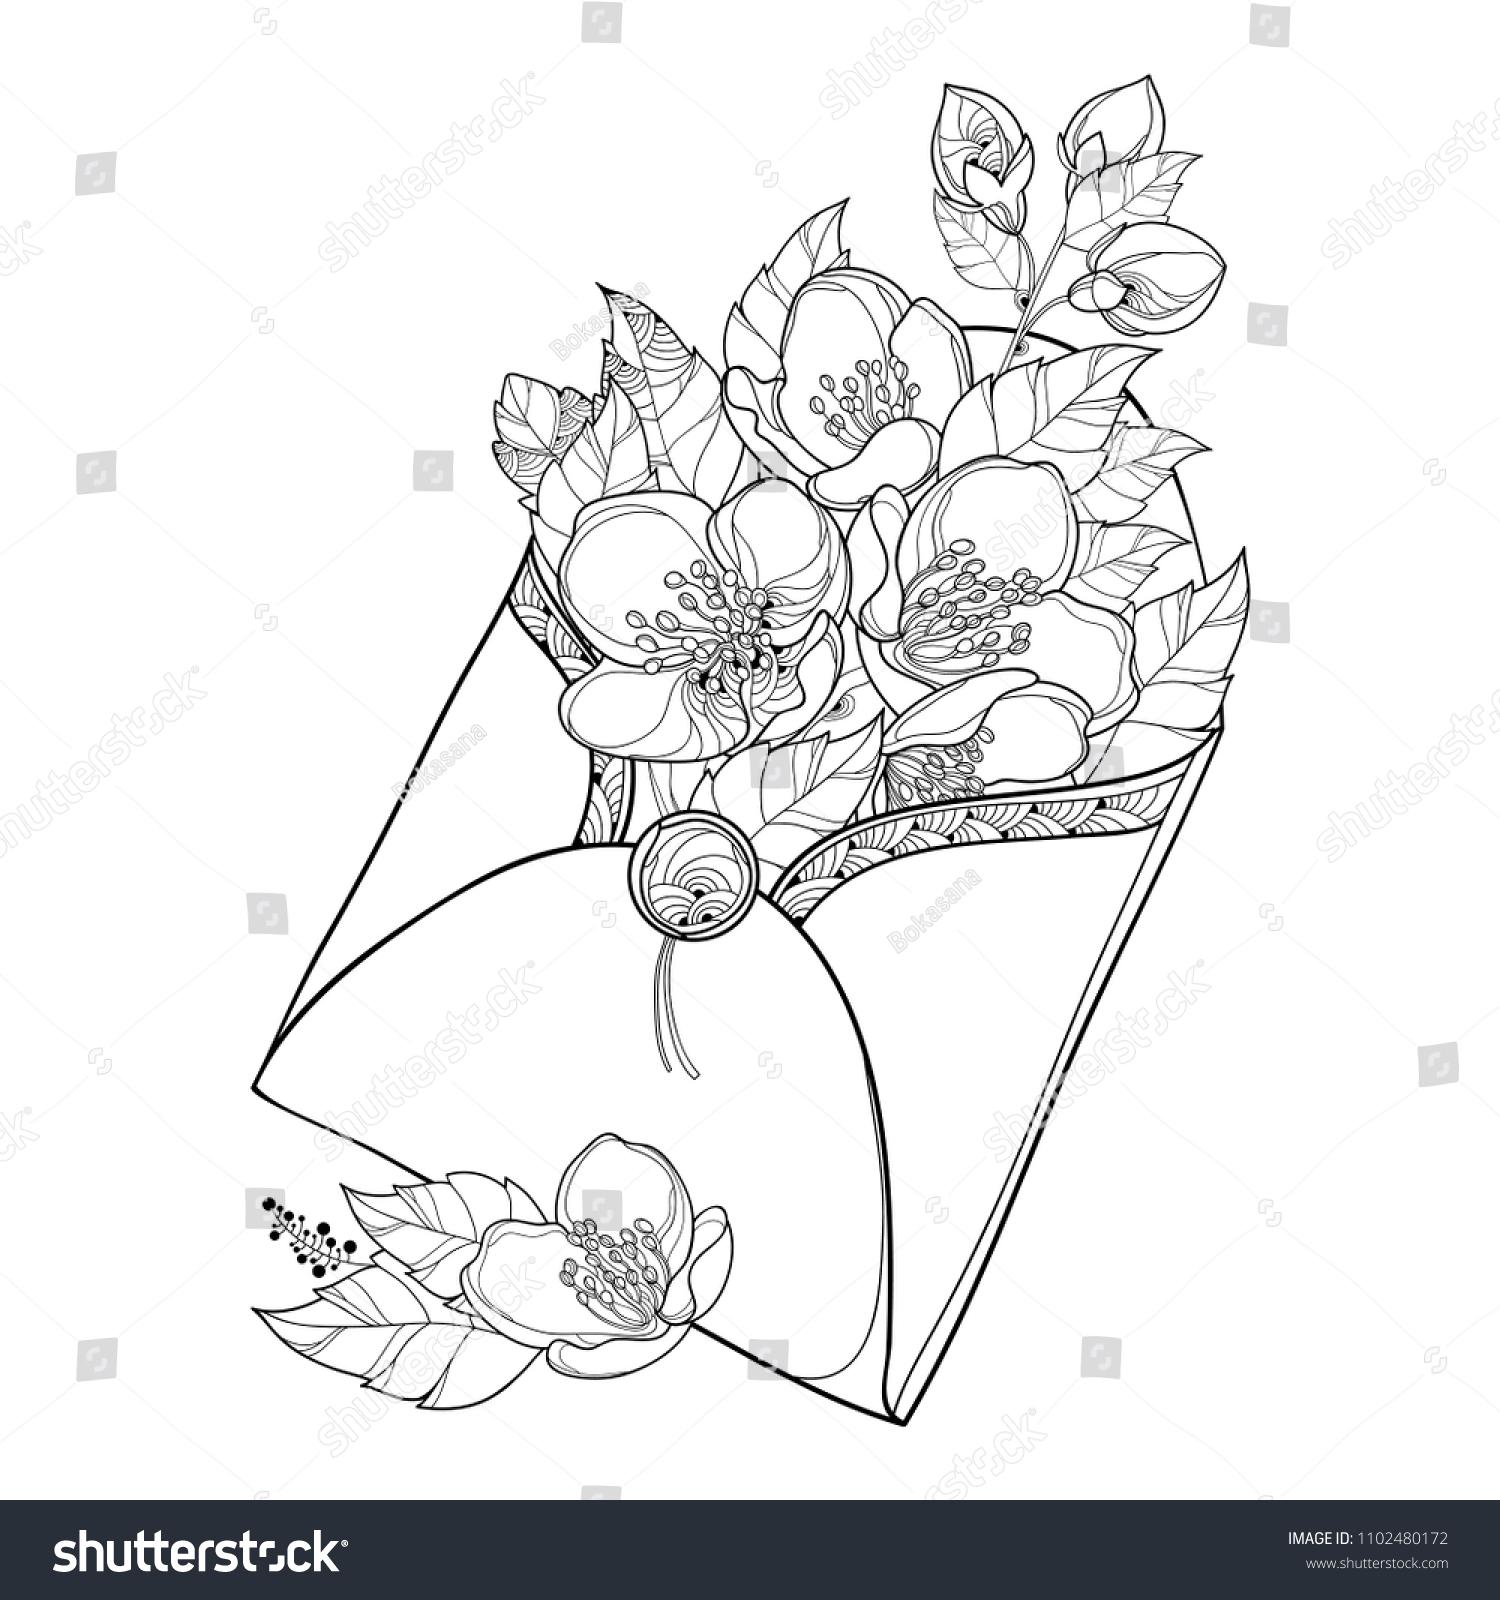 Vector bouquet outline jasmine flower bunch stock vector royalty vector bouquet with outline jasmine flower bunch bud and ornate leaf in black in open izmirmasajfo